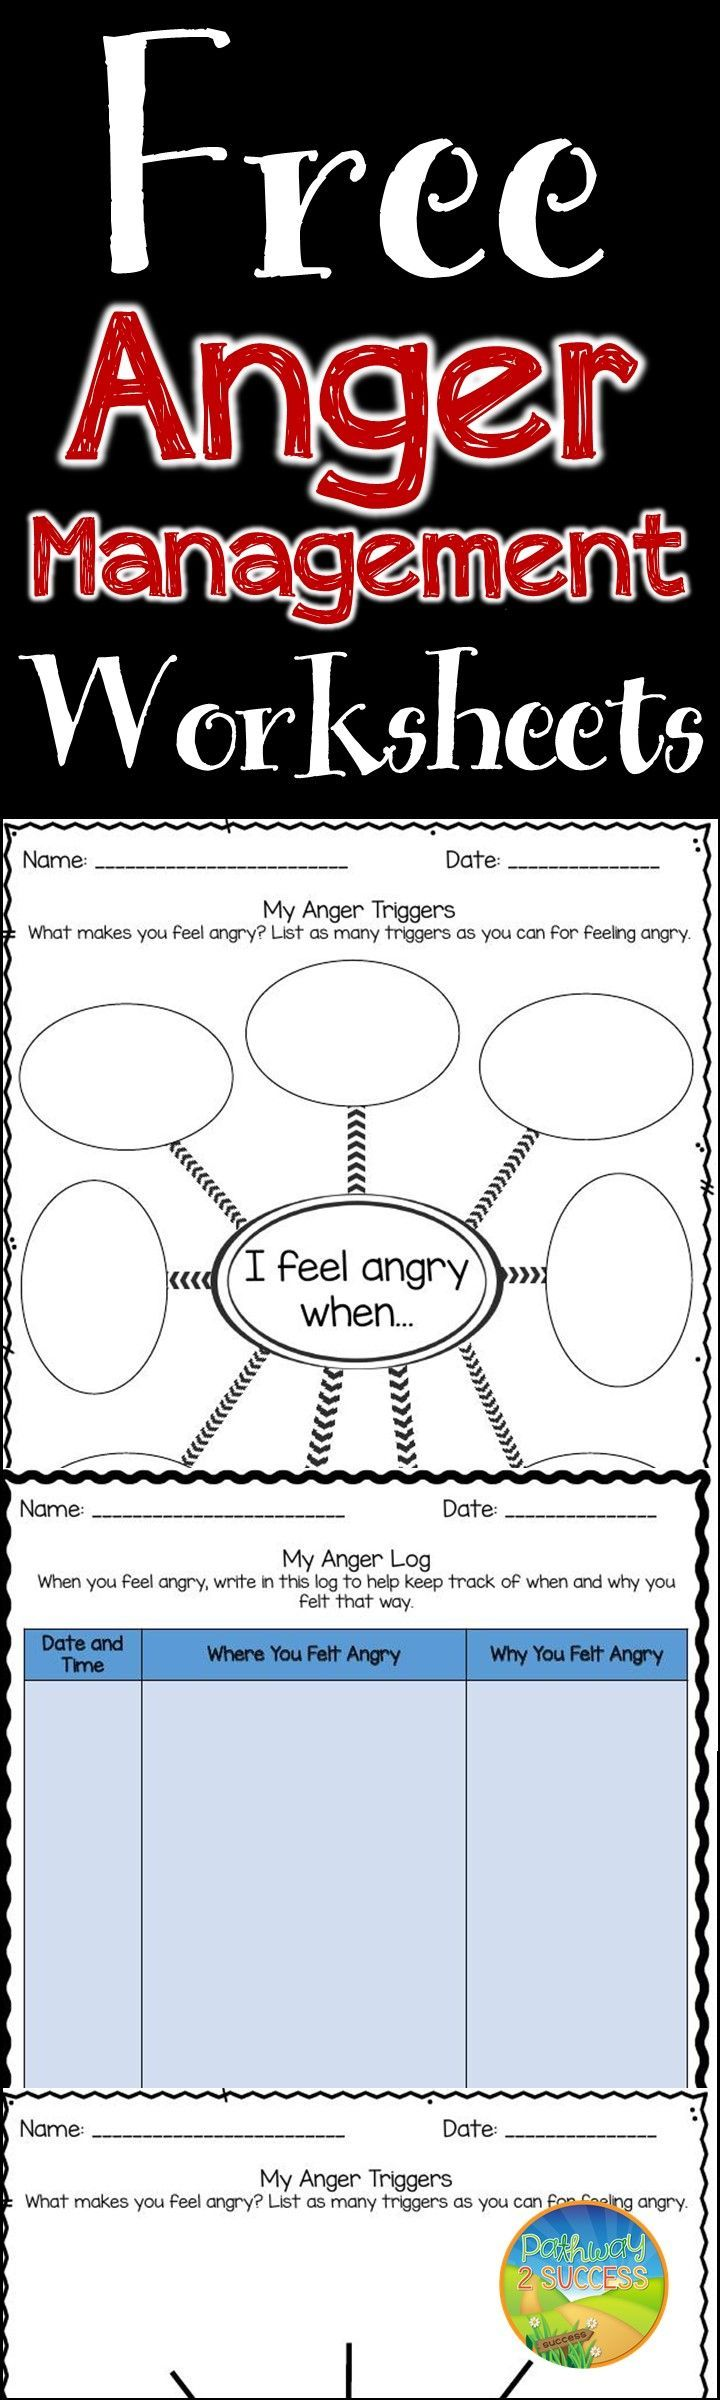 FREE worksheets for anger management skills   Anger ...